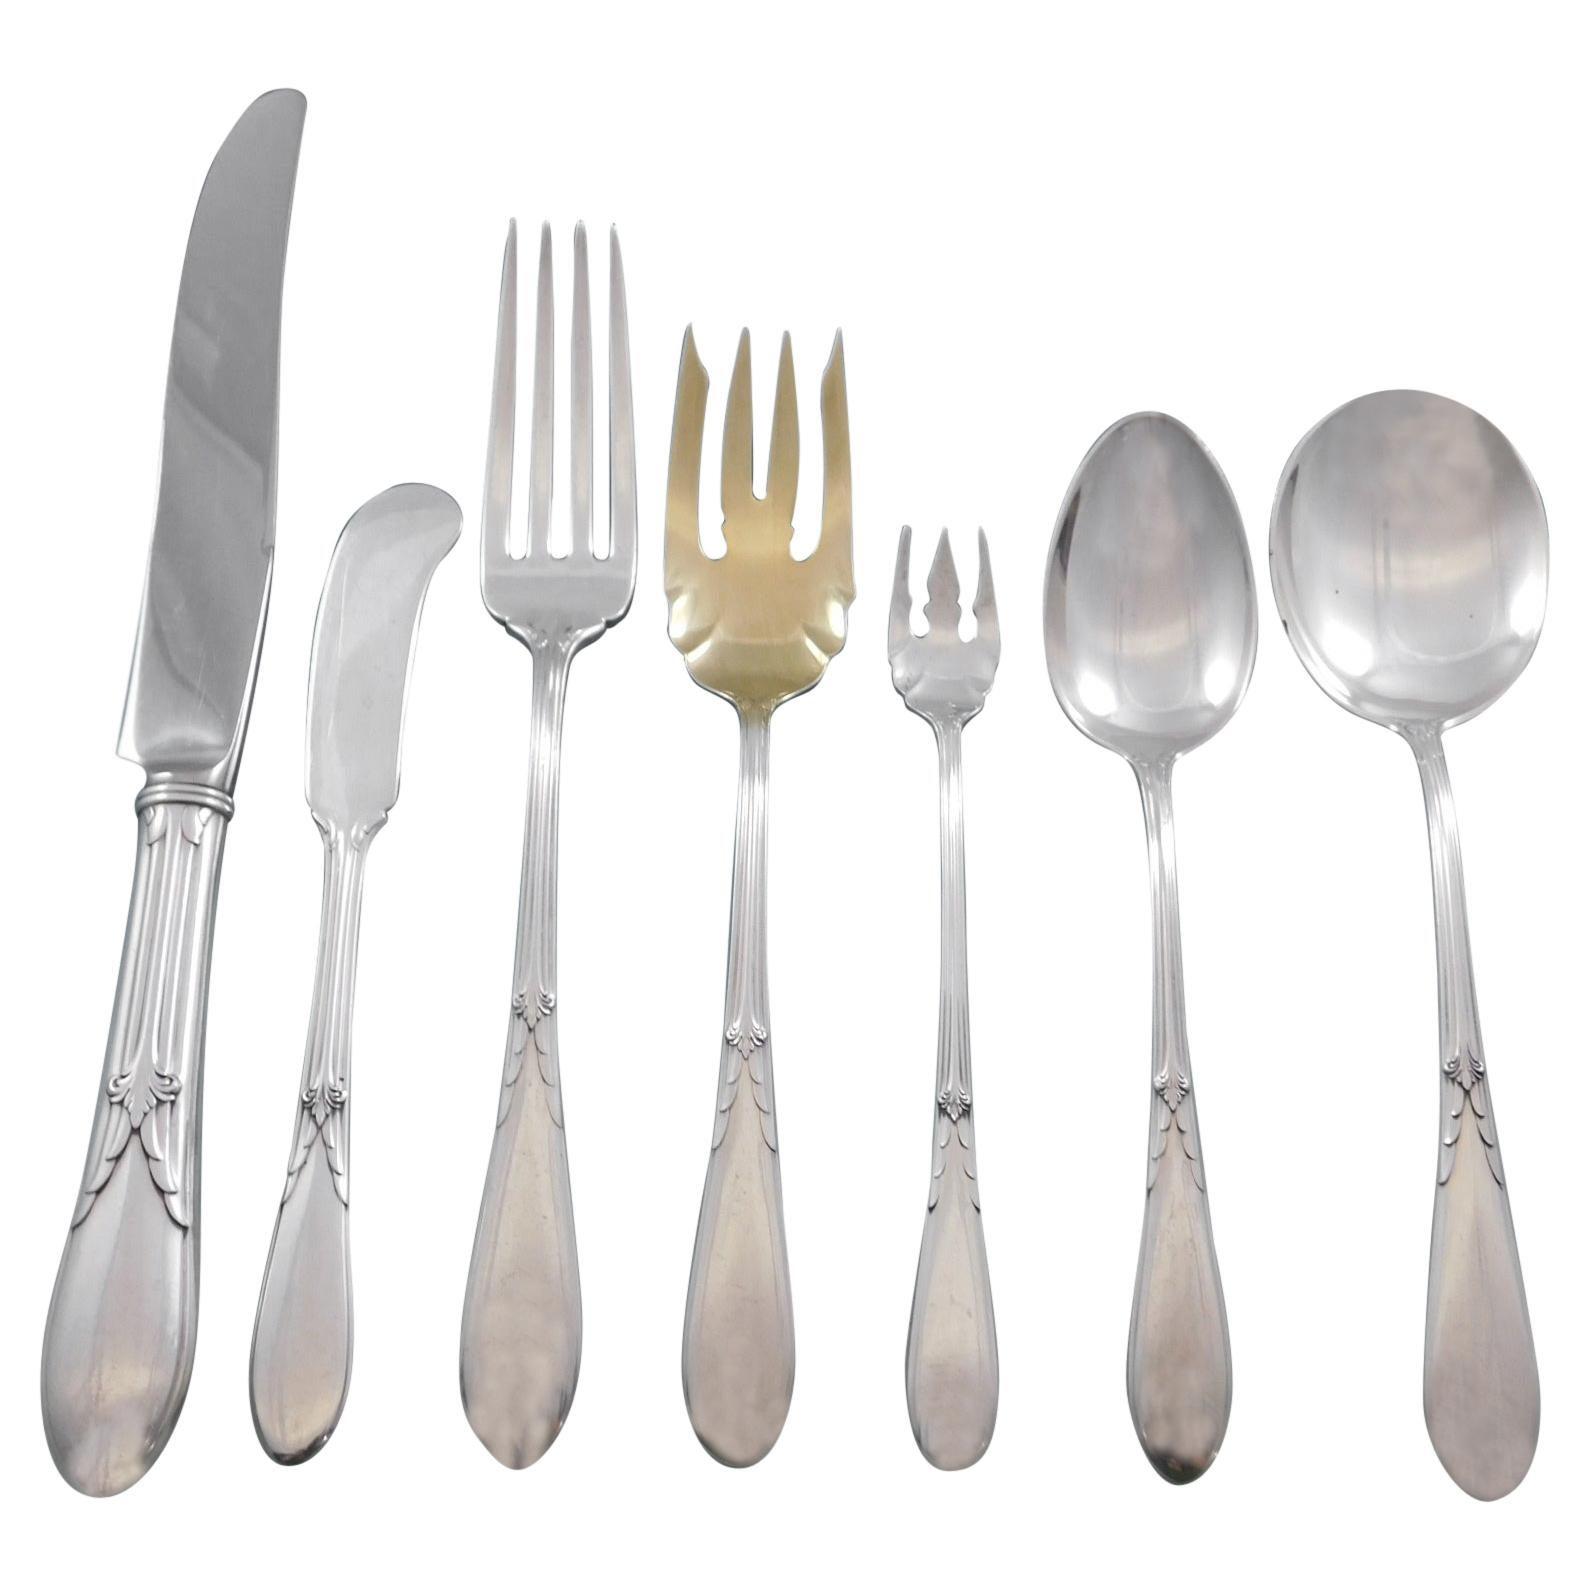 Gorham Manufacturing Company Tableware